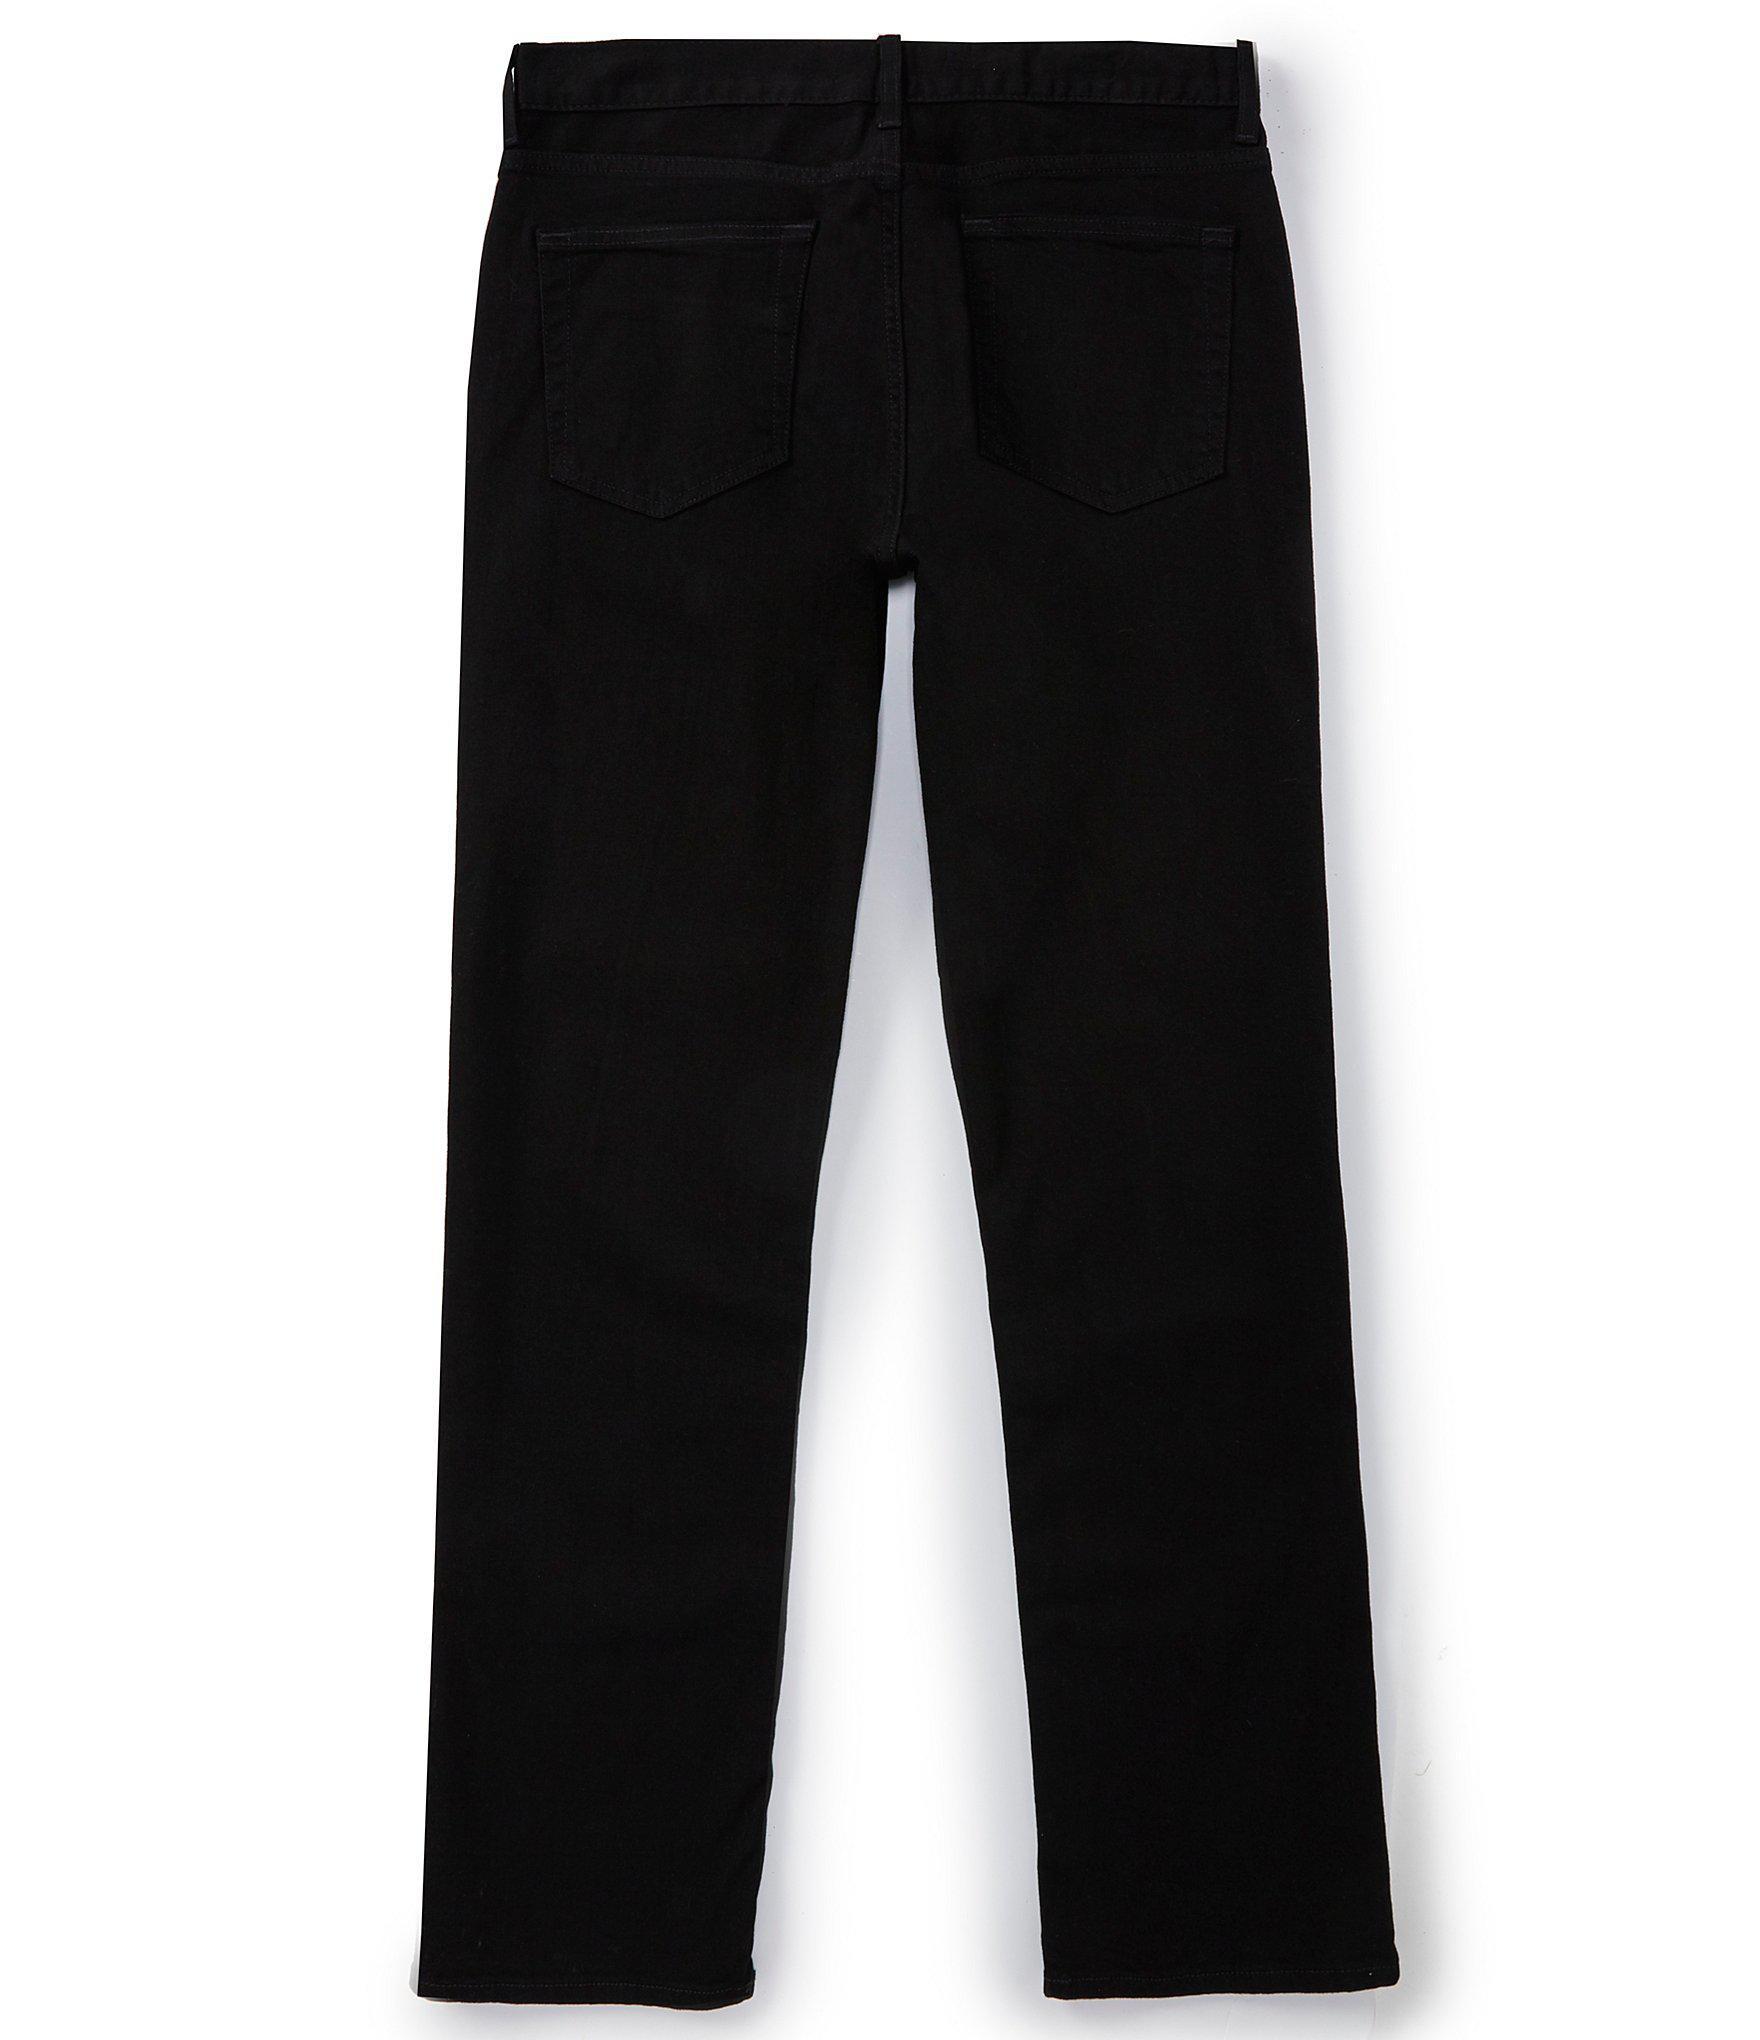 dcd46fc3f5 Lyst - Cremieux Jeans Big & Tall Straight-fit Stretch Jeans in Black ...